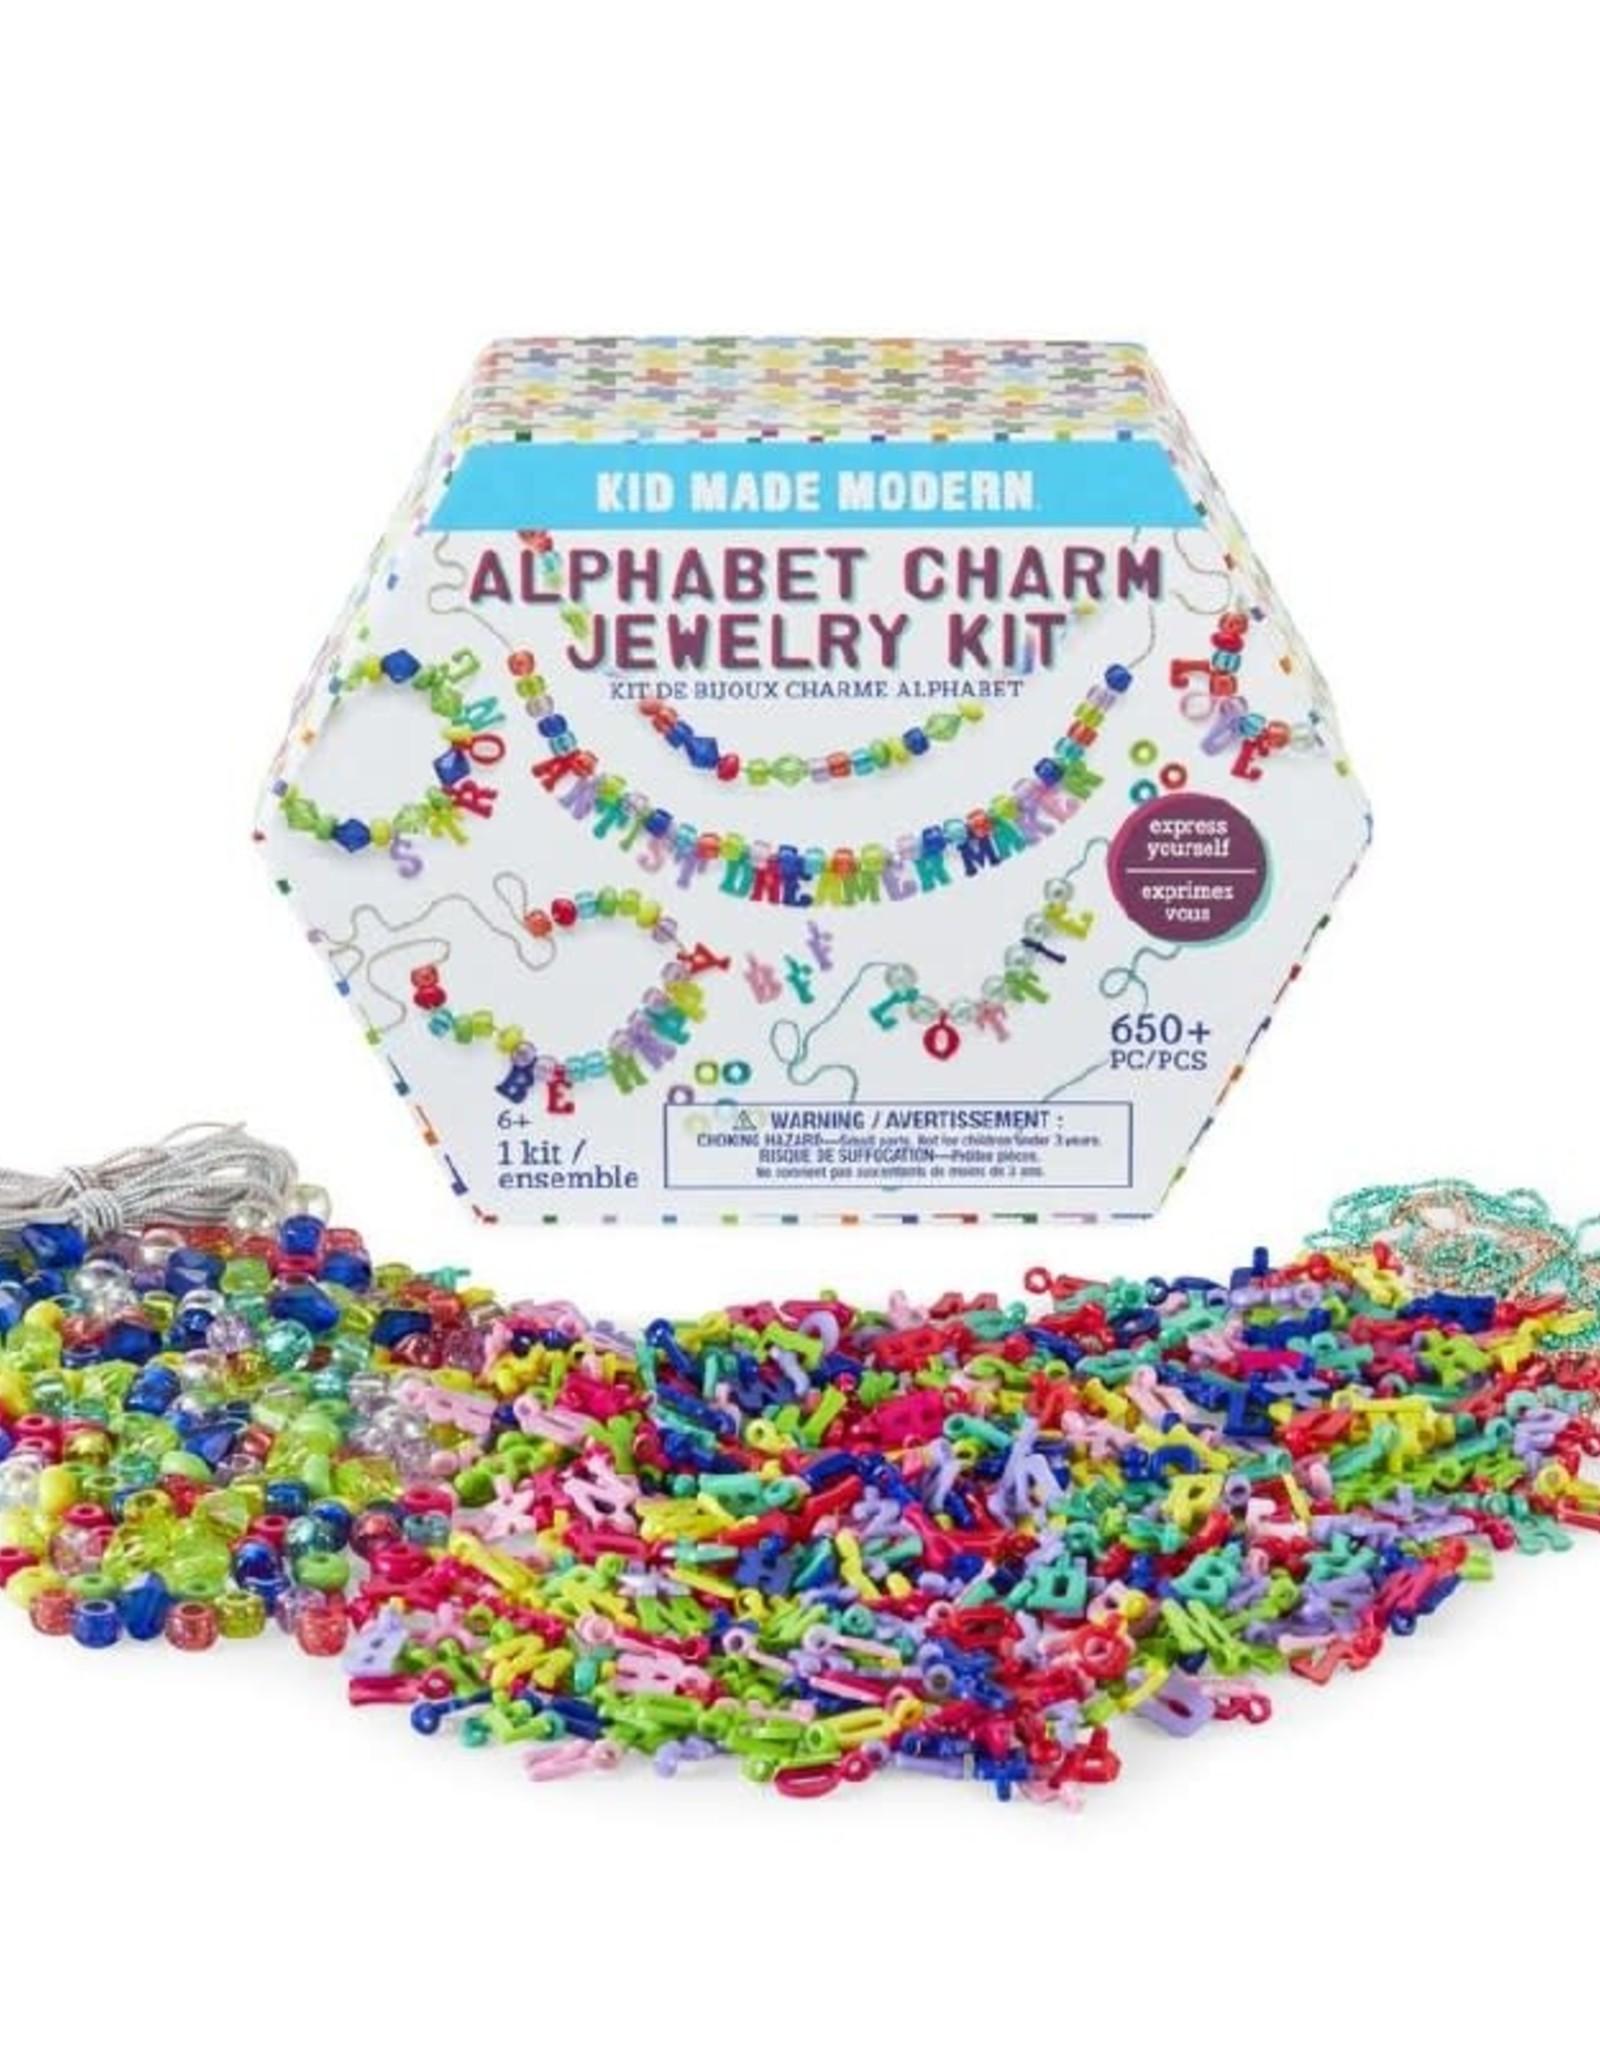 Kids Made Modern Alphabet Charm Jewelry Kit